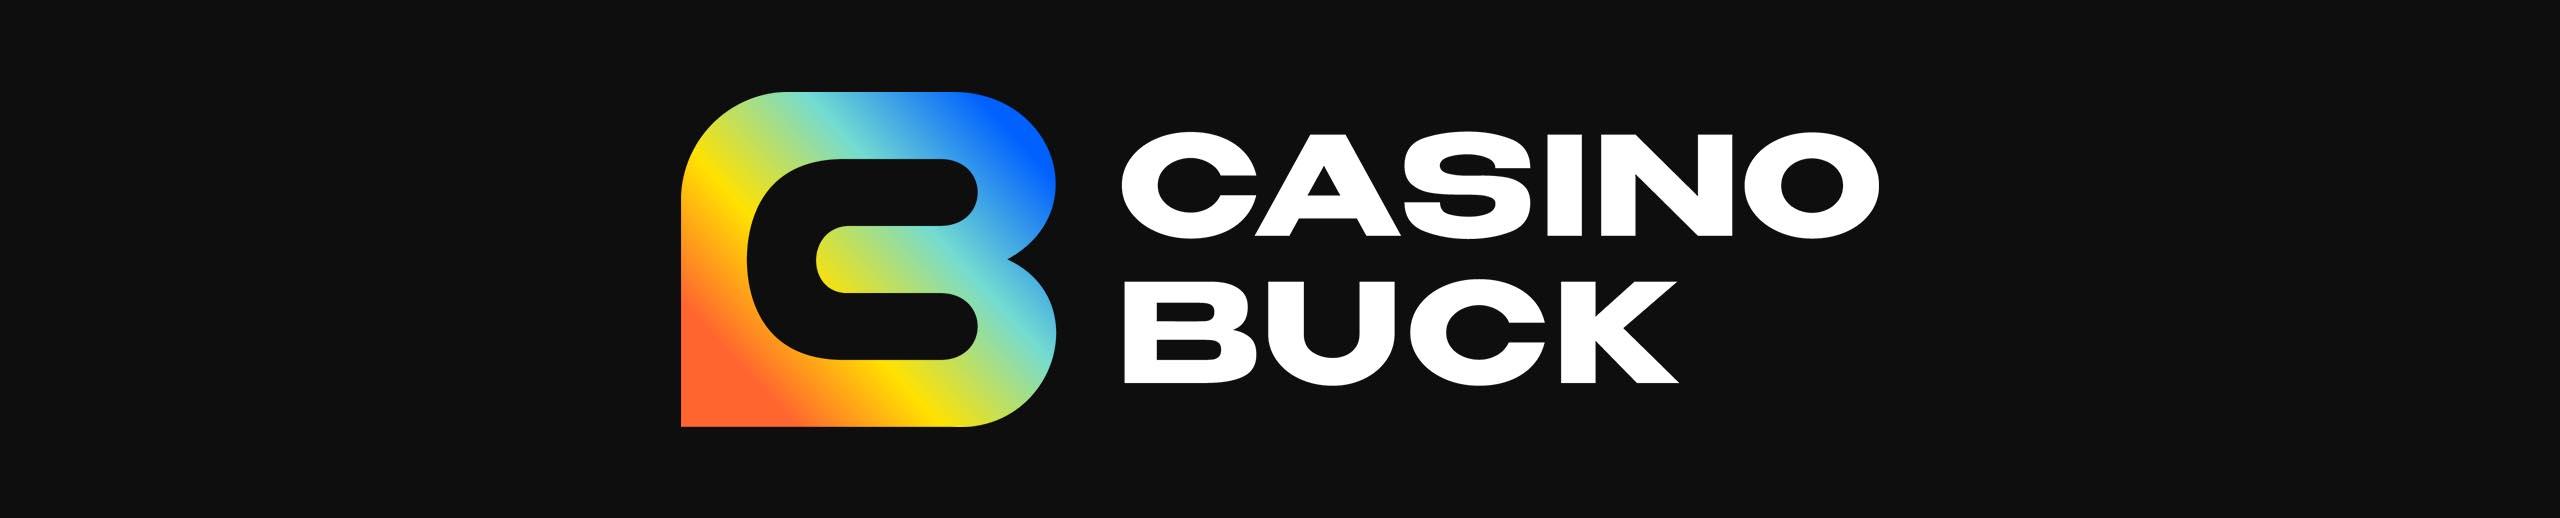 CasinoBuck Online Casino